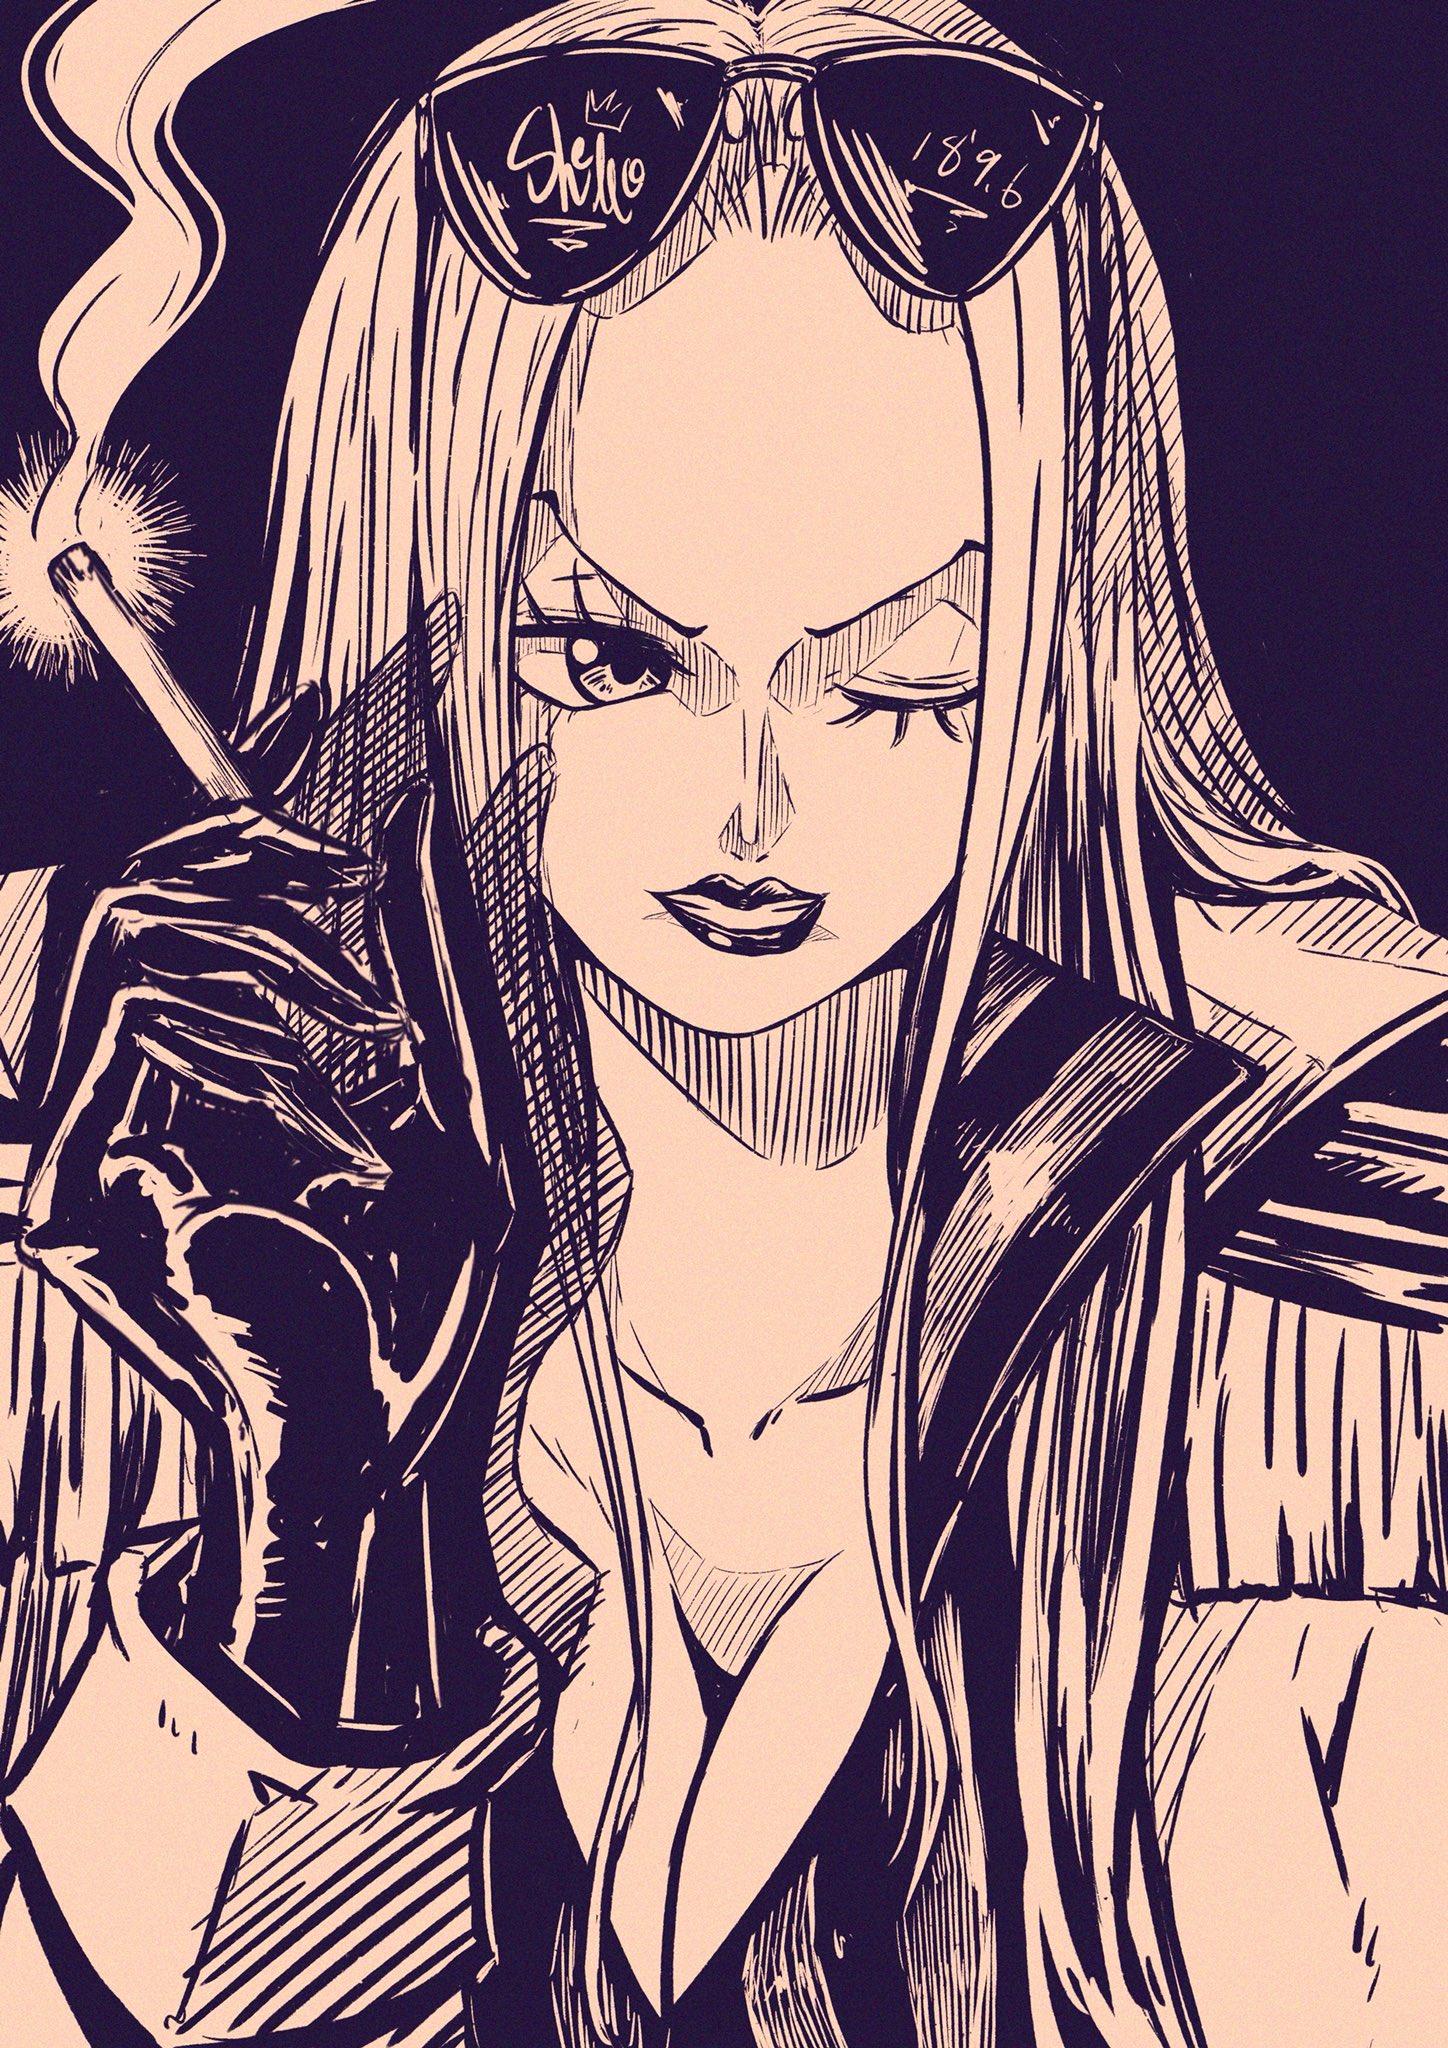 Hina (ONE PIECE) Image #2386199 - Zerochan Anime Image Board